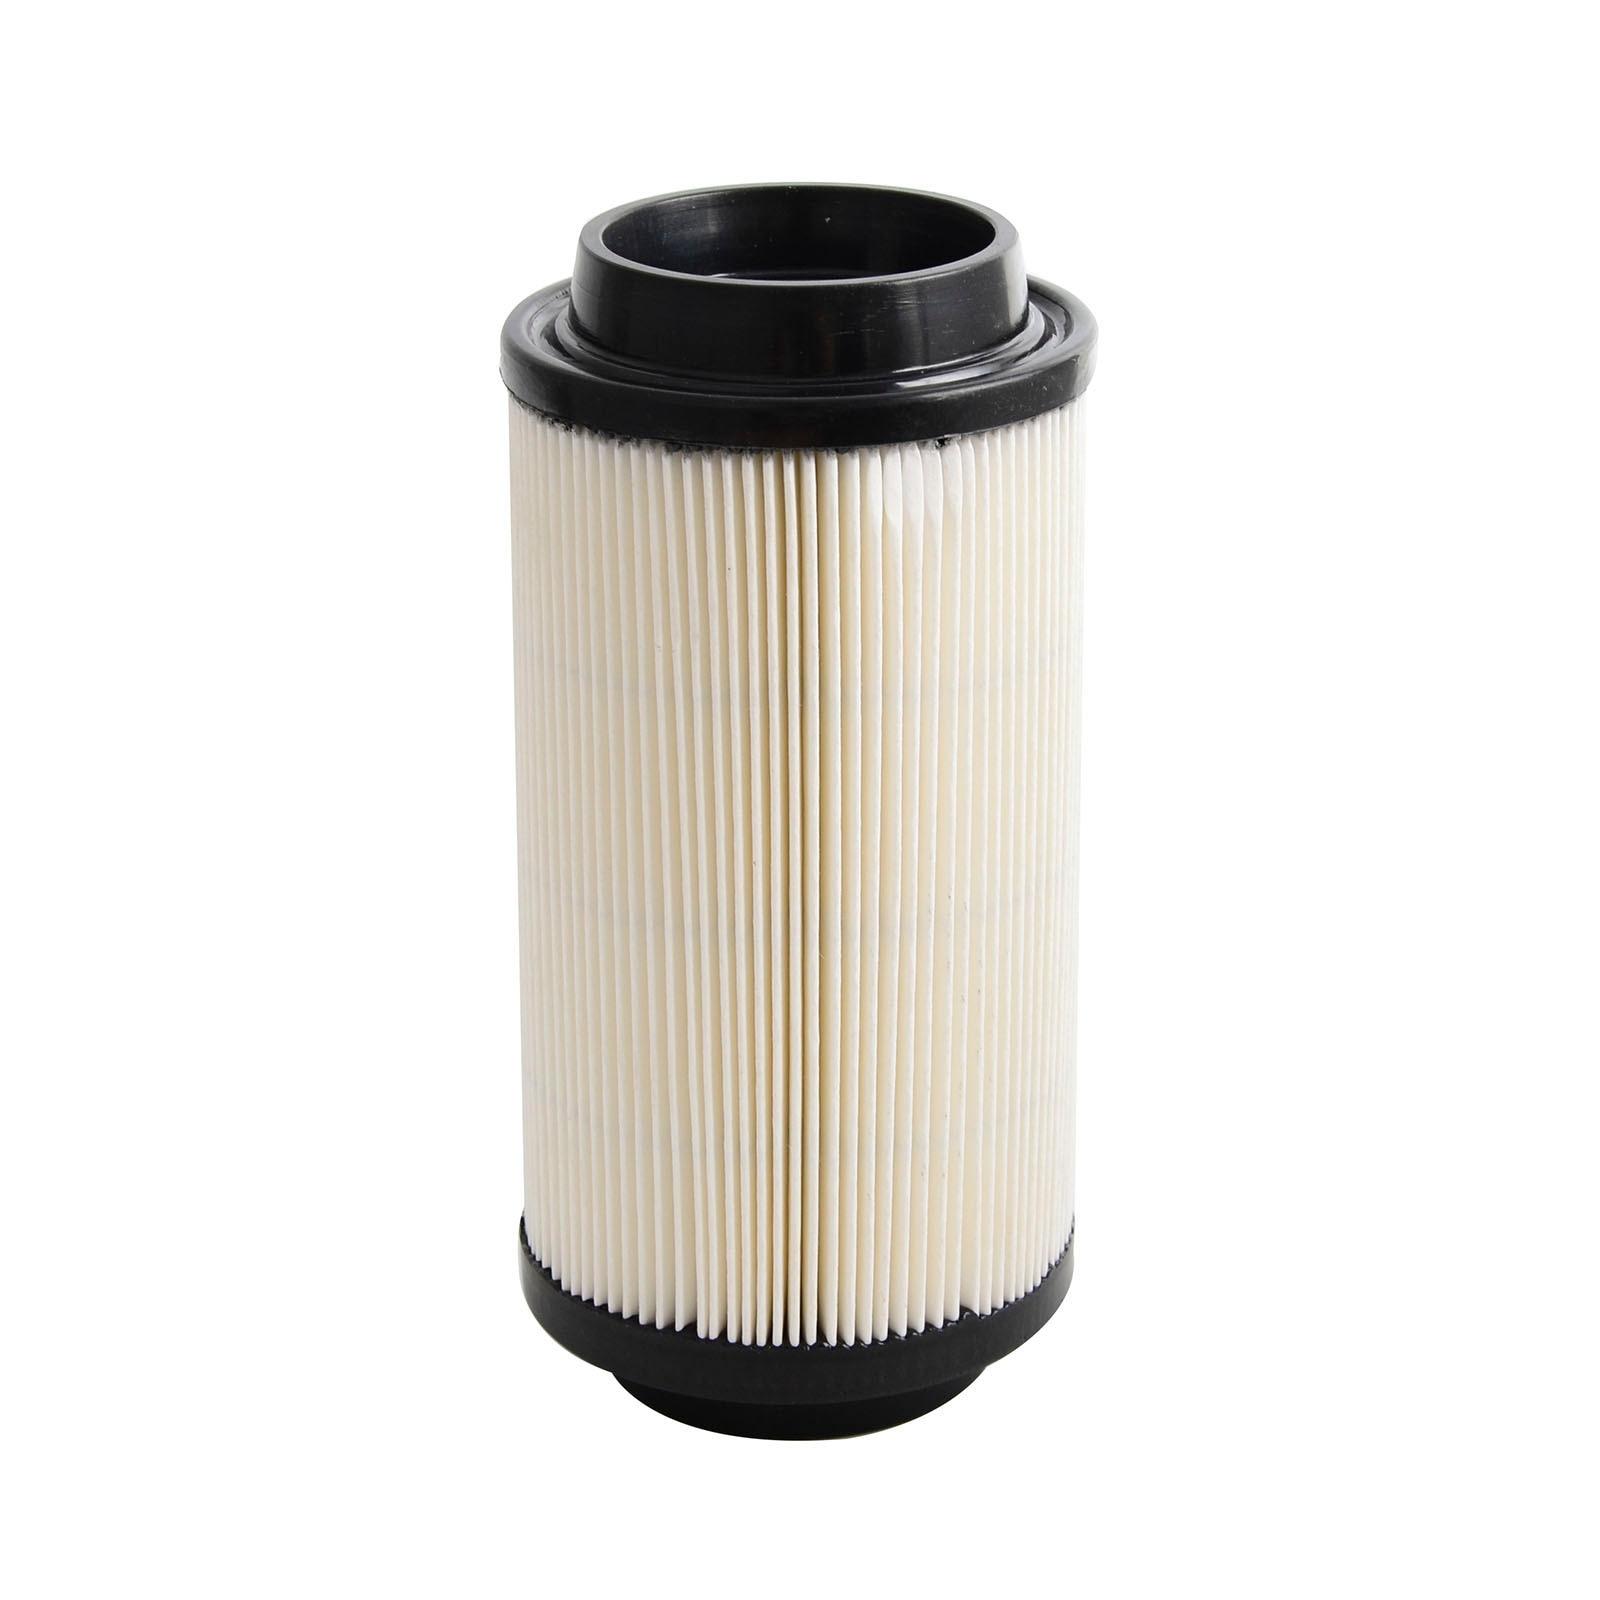 NICECNC Air Filter For Polaris Sportsman Scrambler 400 500 600 700 800 550 850 #7080595